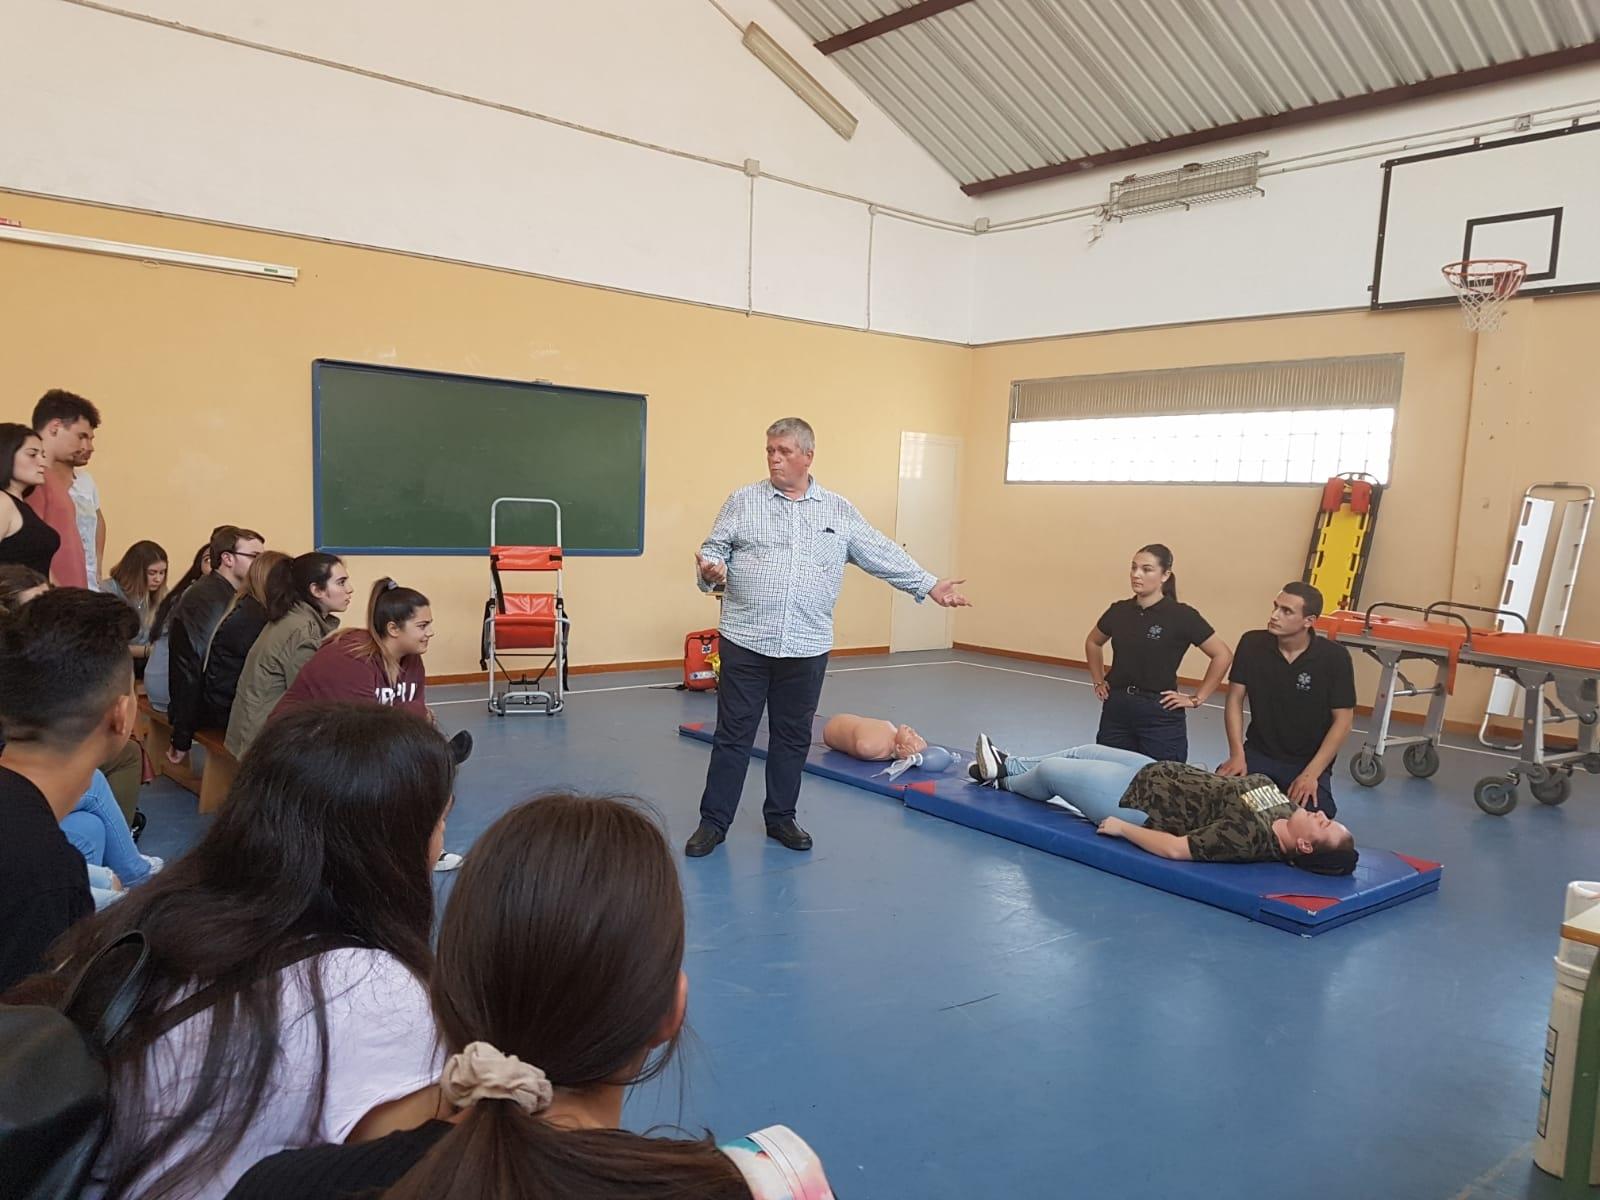 visita-CF-Motril-Salobreña-2019-04